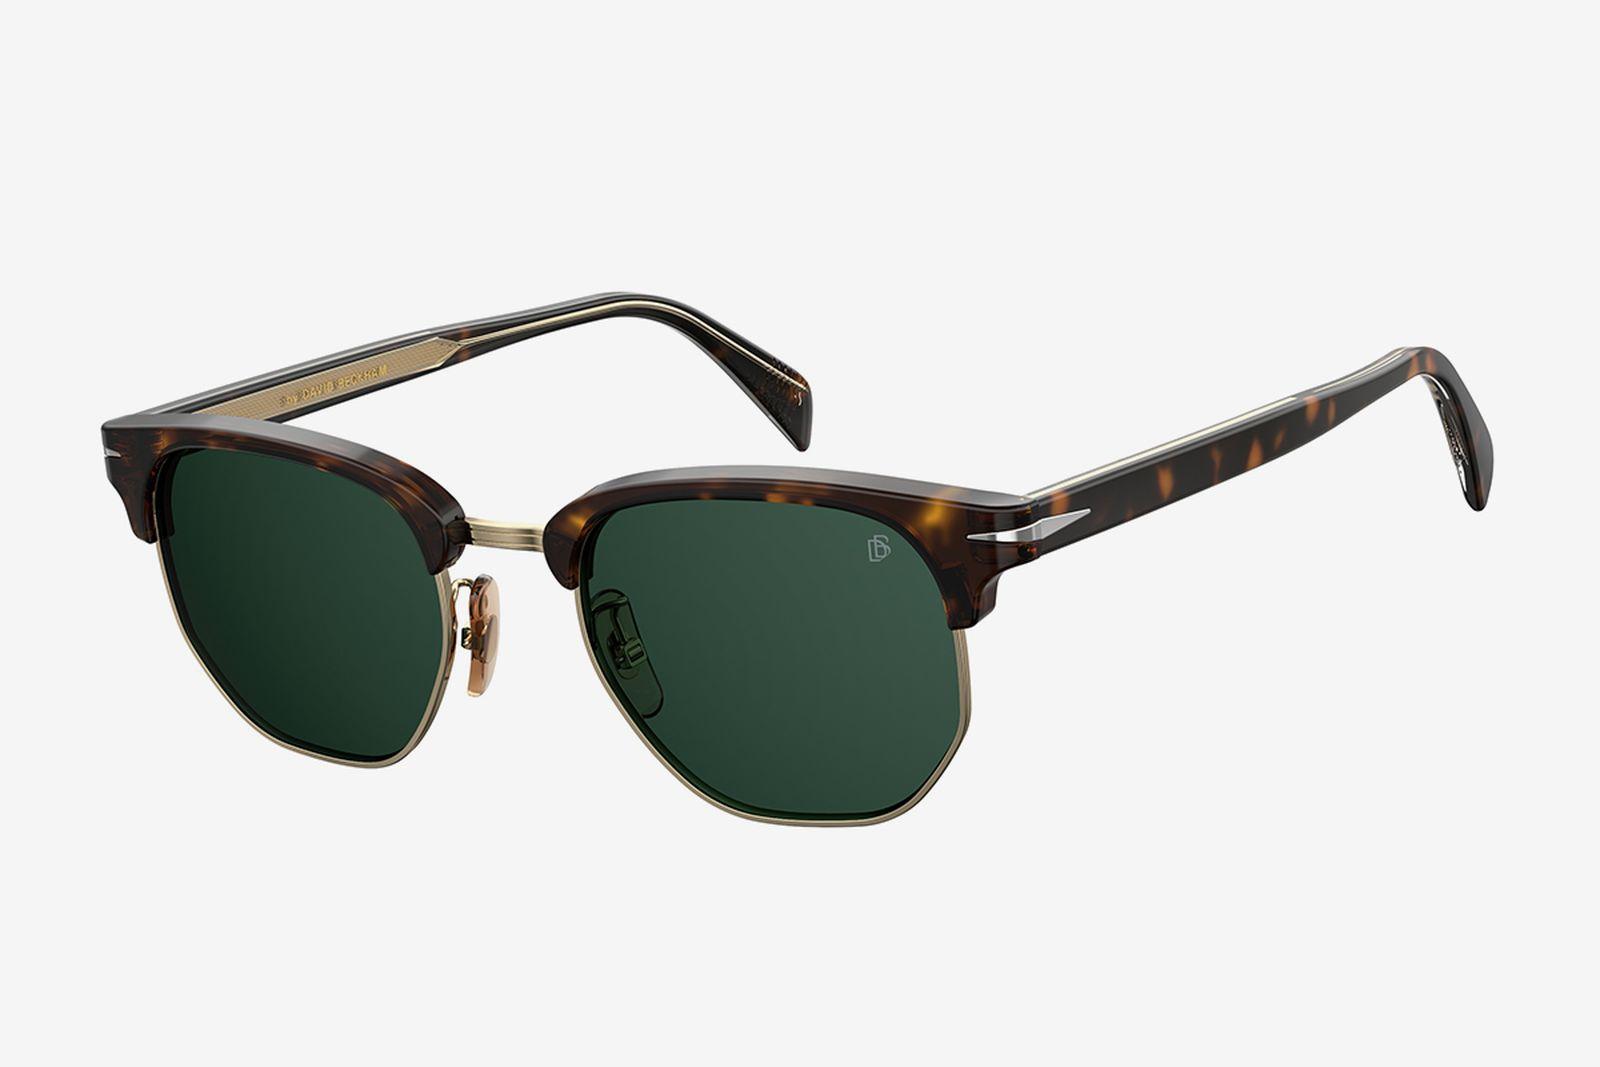 db-sunglasses-ss20-07